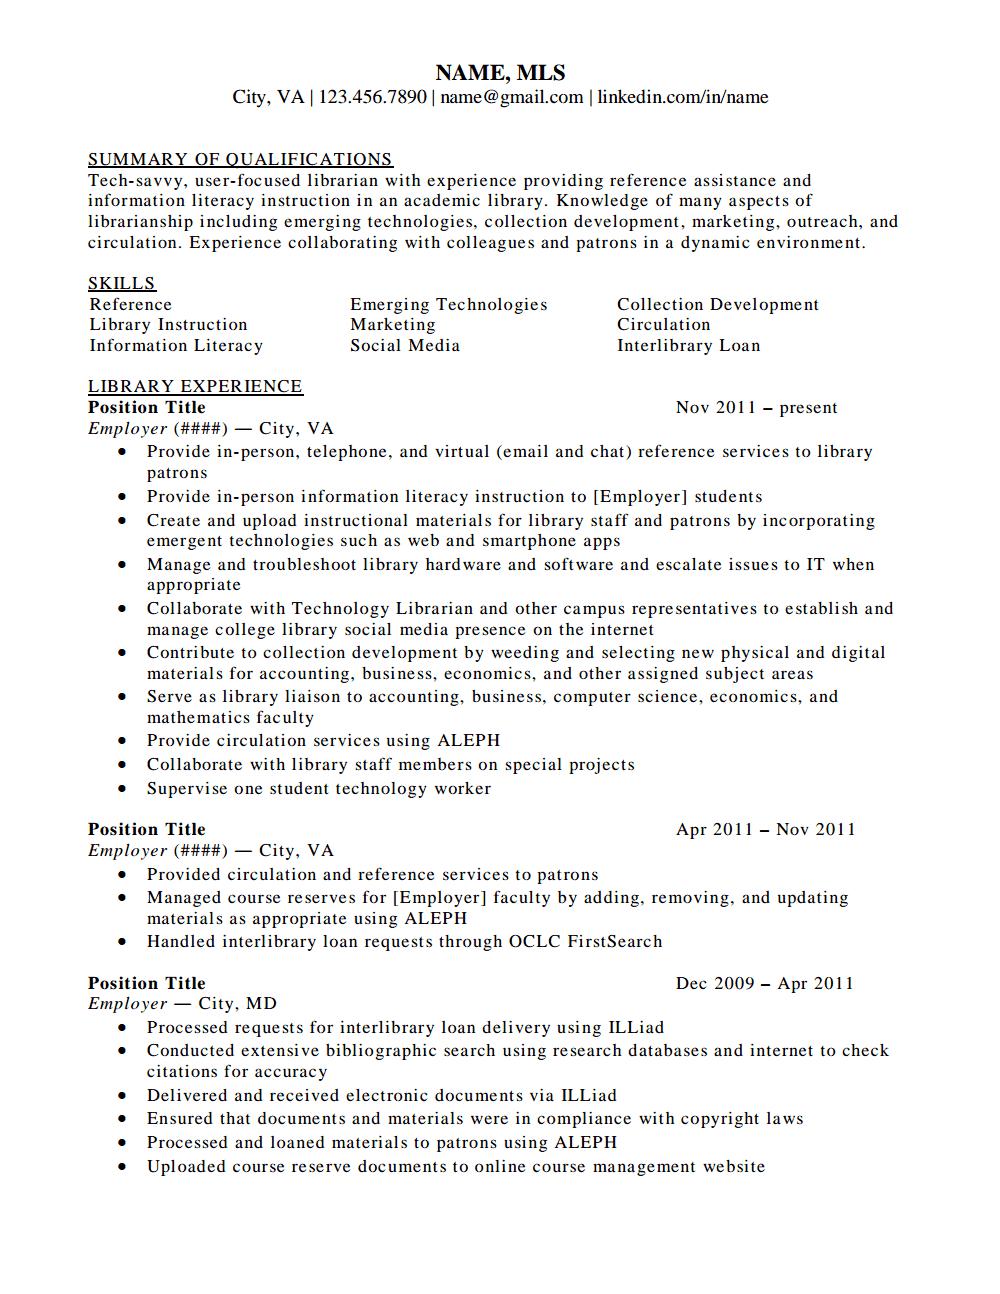 librarian resume - solarfm.tk